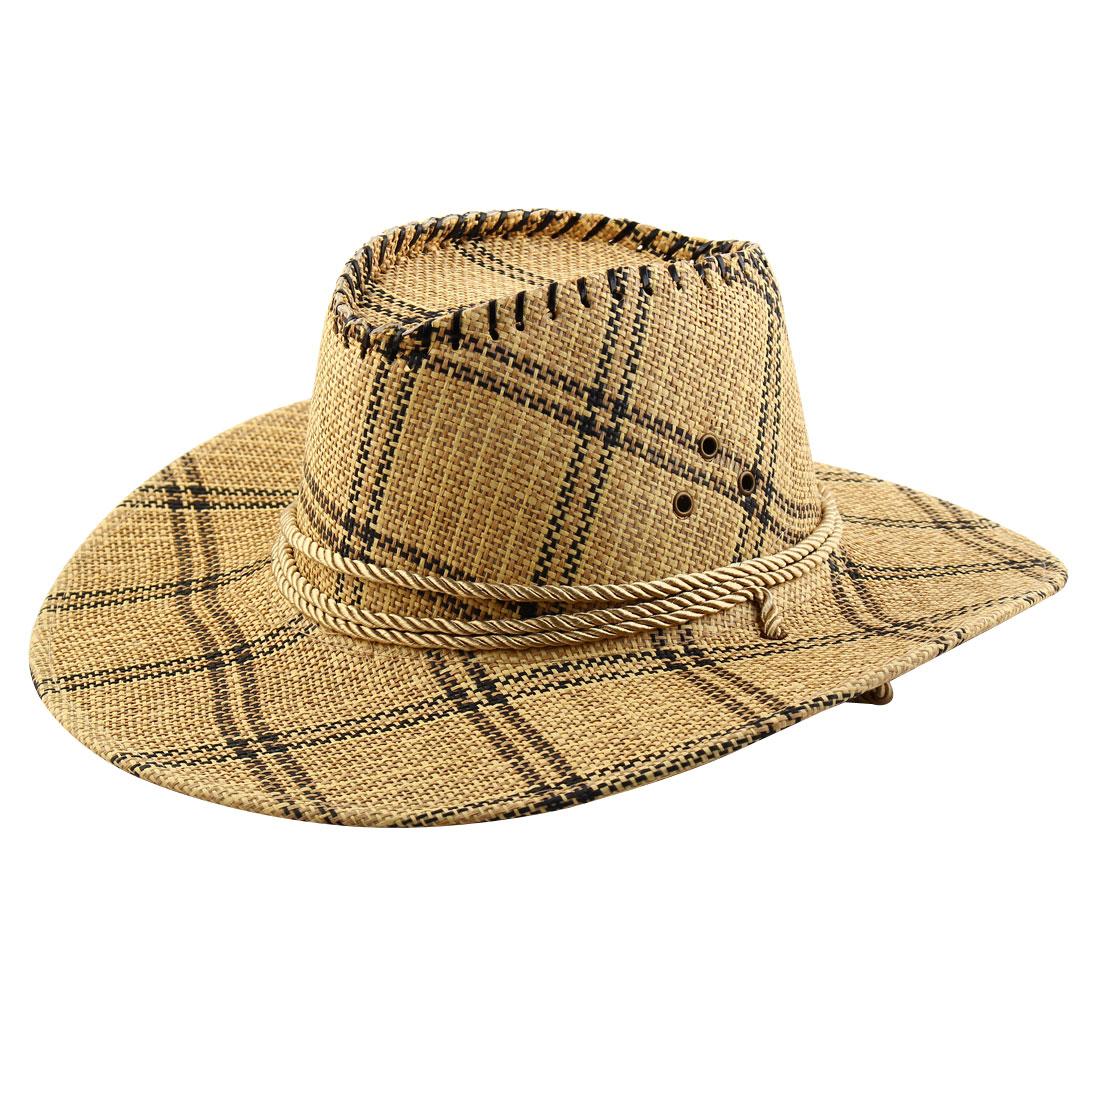 Men Straw Braided Grid Pattern Western Style Beach Sunhat Cowboy Hat Light Brown